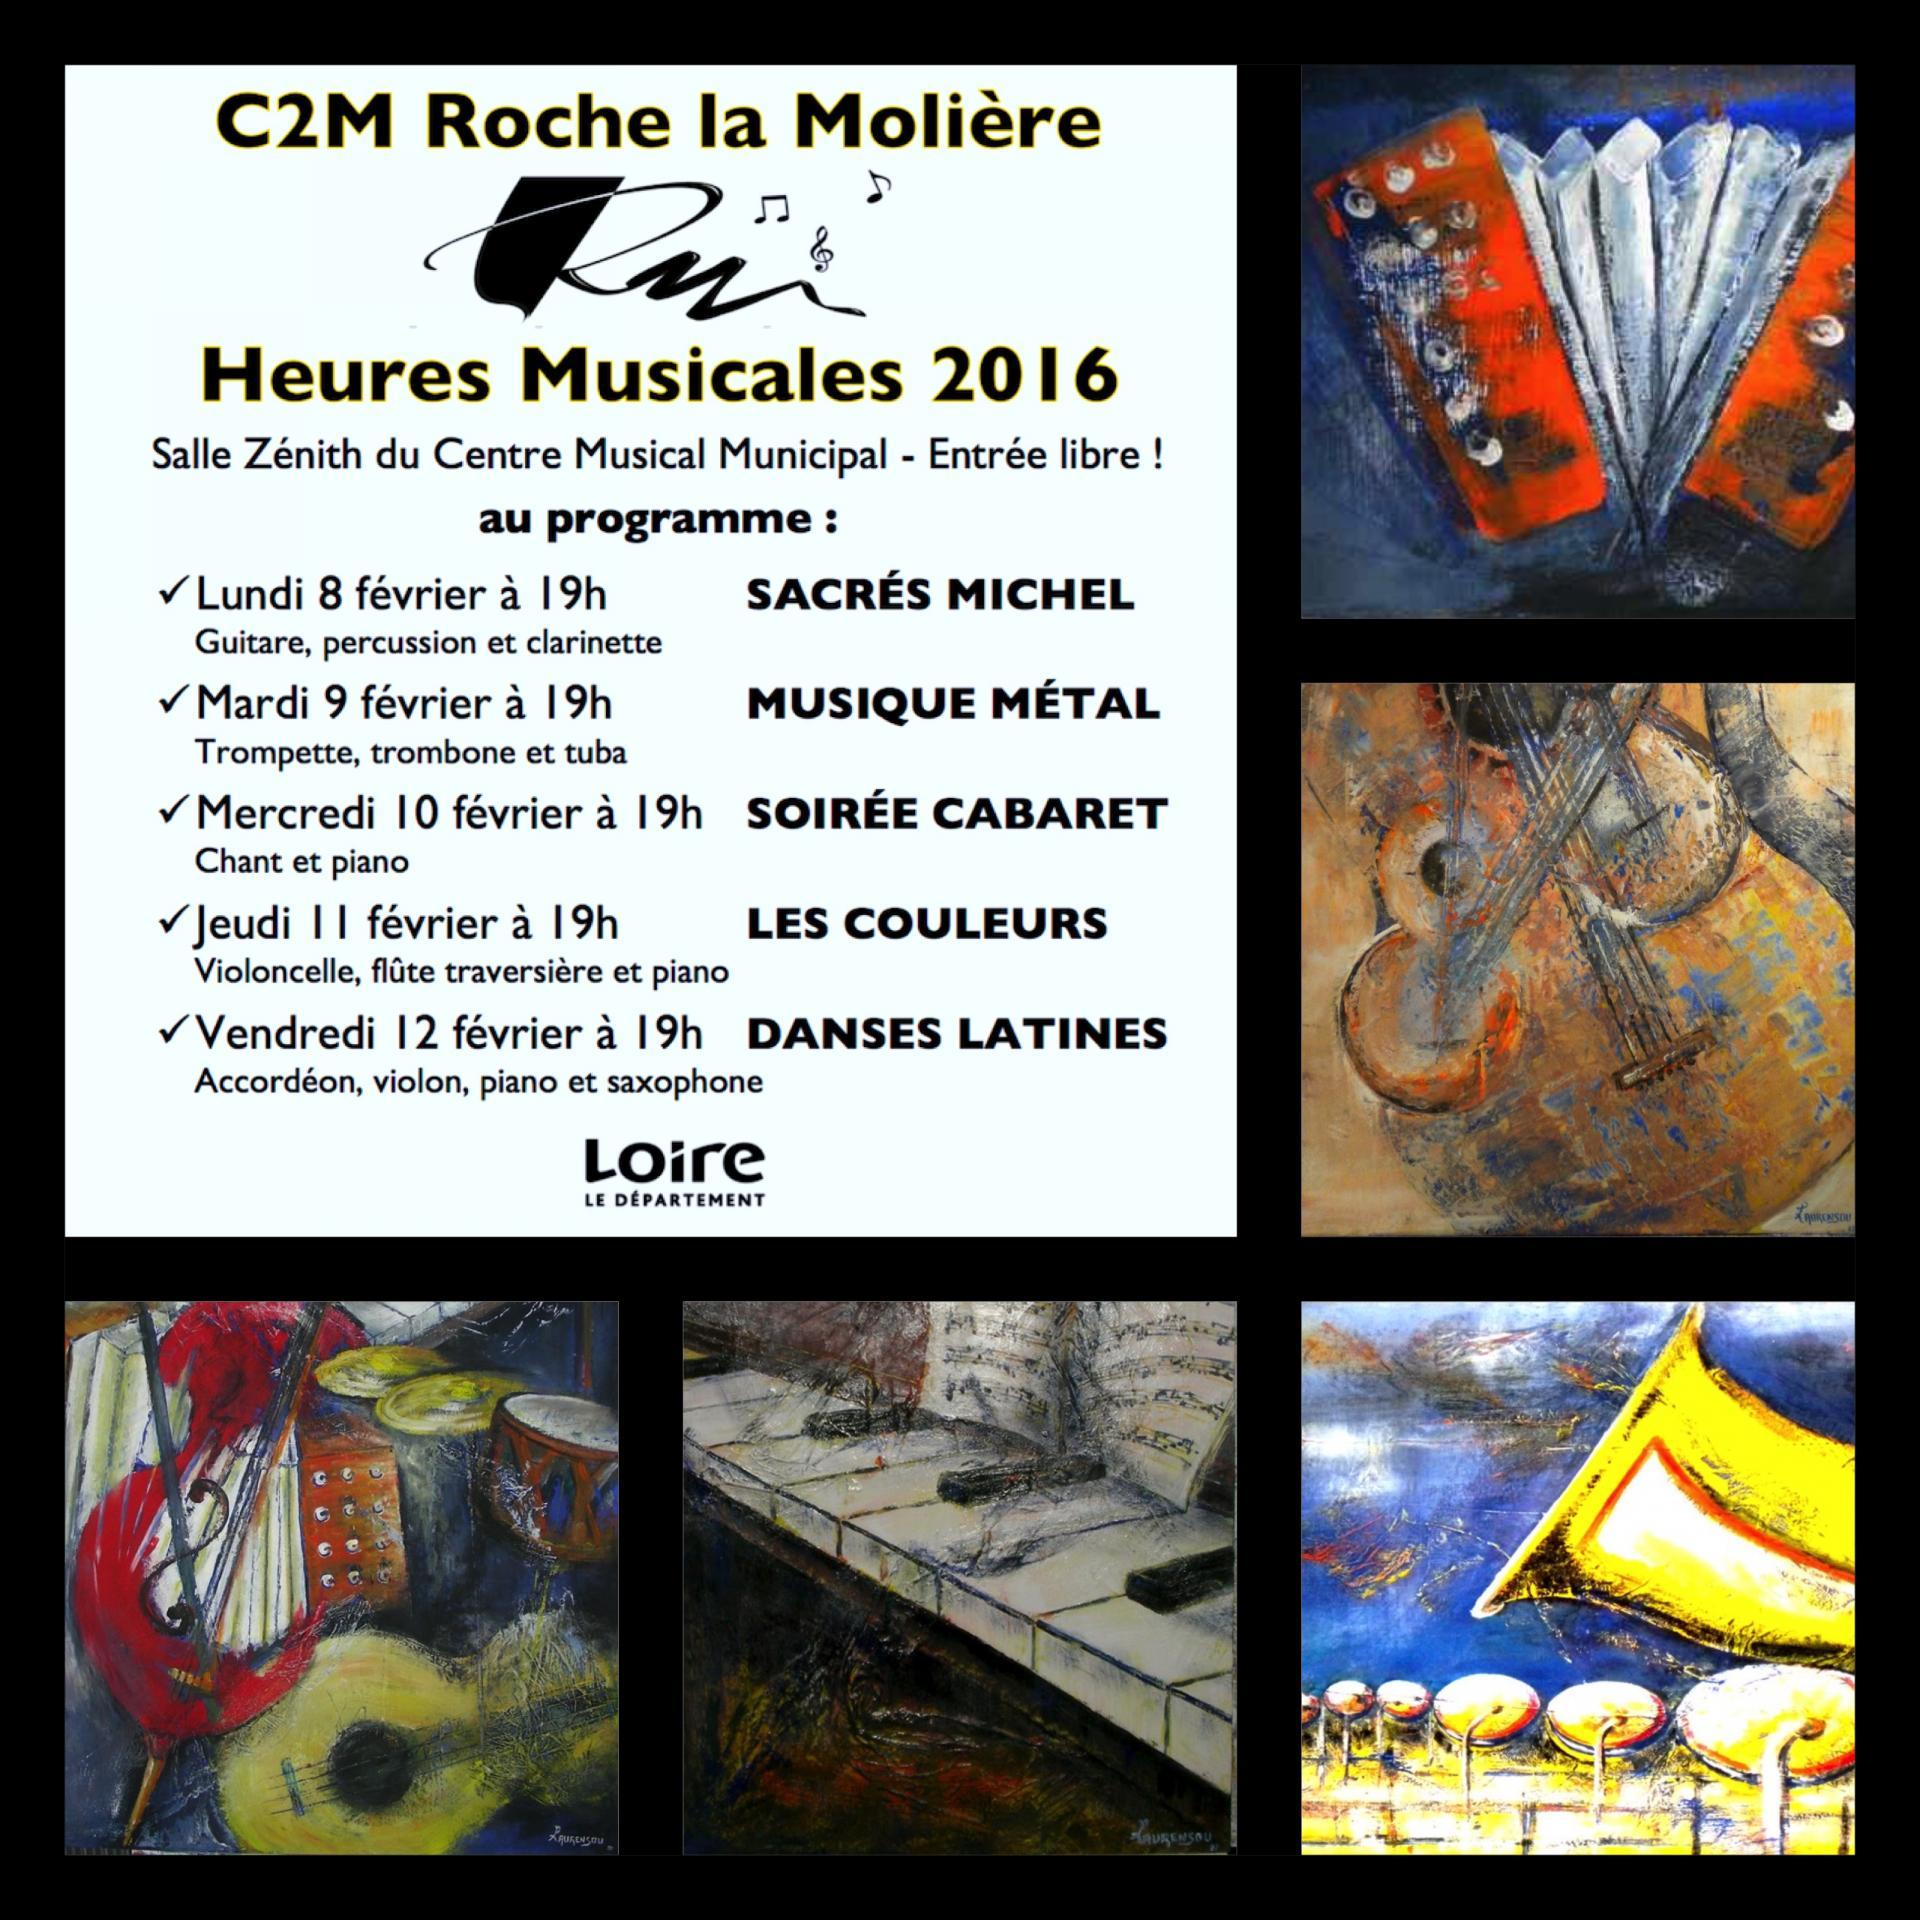 Heures musicales 2016